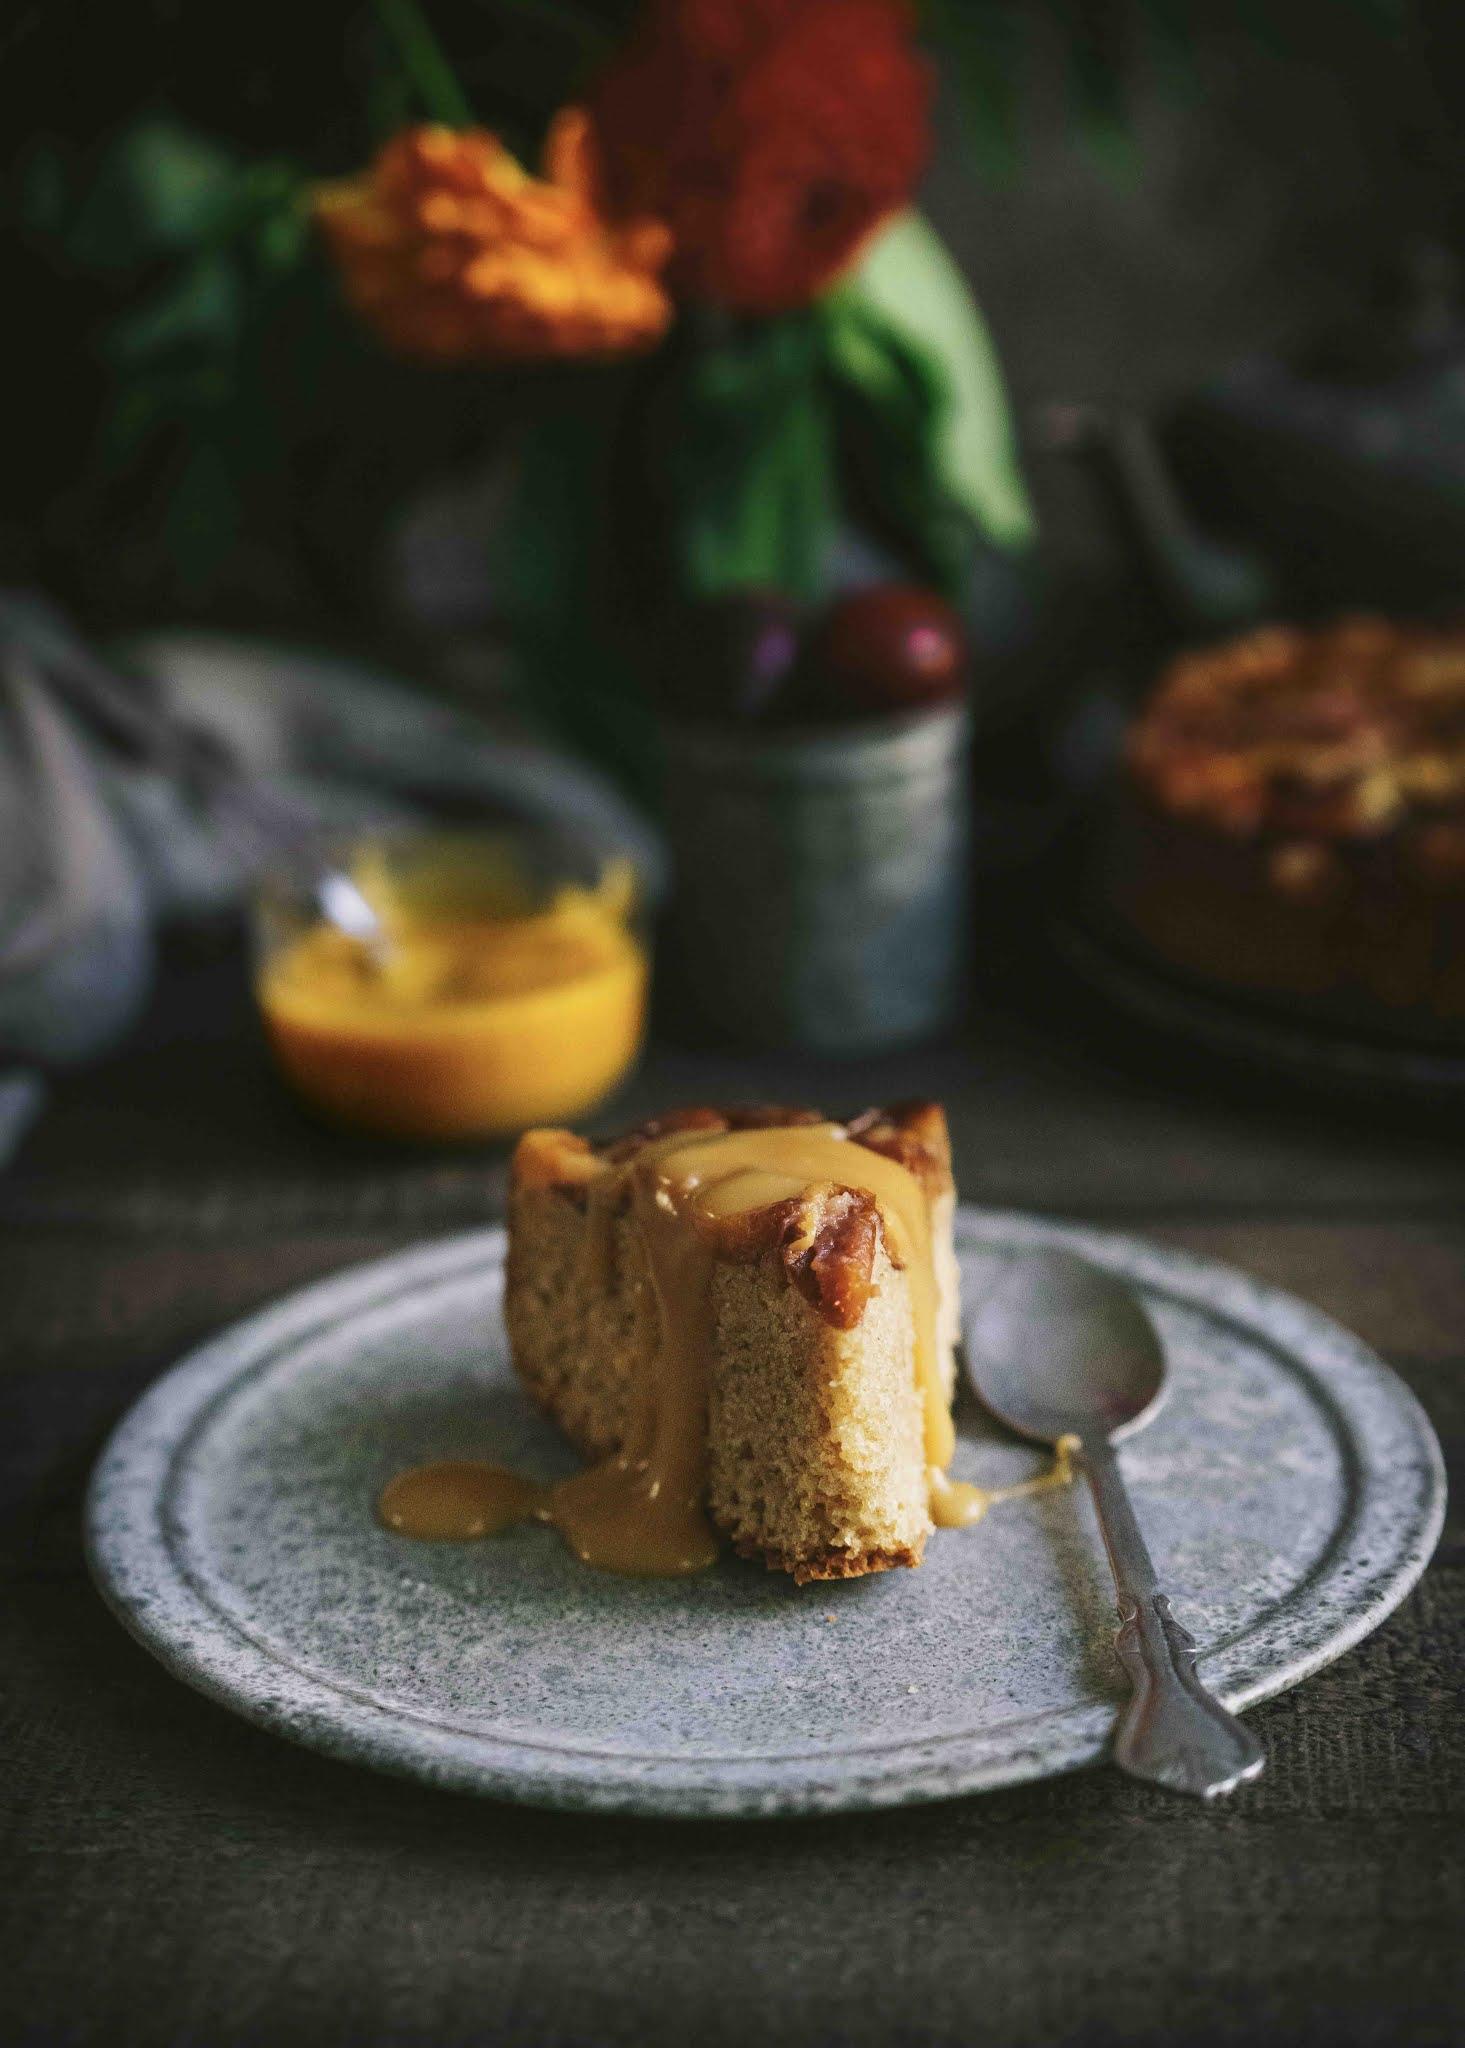 gateau , dessert d'automne, prunes , quetsches